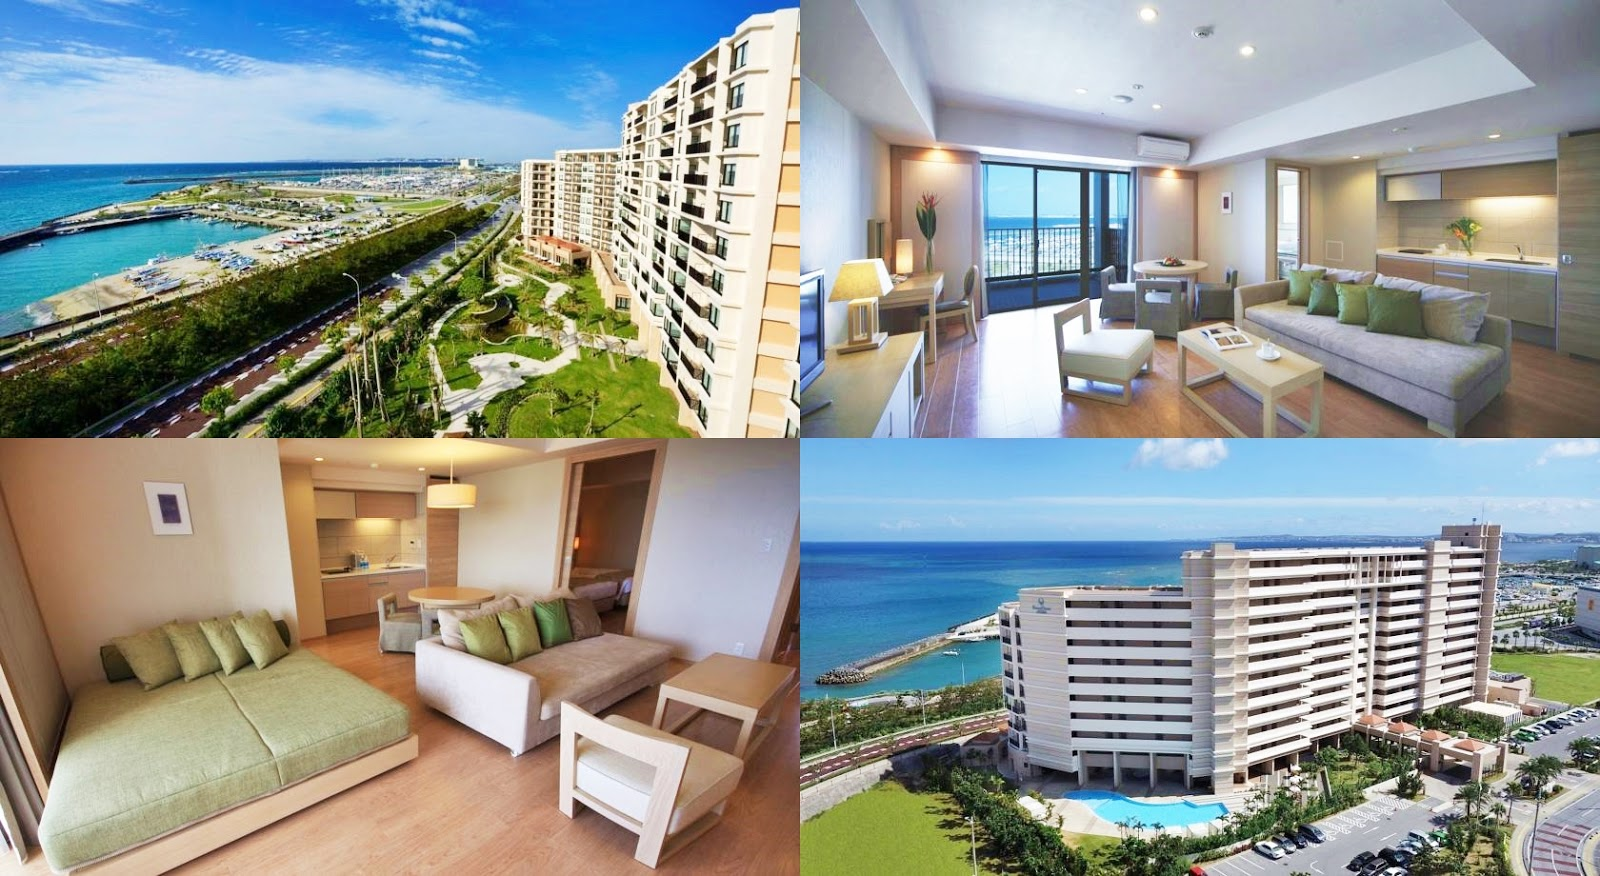 沖繩-住宿-推薦-月球海洋宜野灣公寓酒店-Moon-Ocean-Ginowan-Hotel&Residence-Okinawa-hotel-recommendation